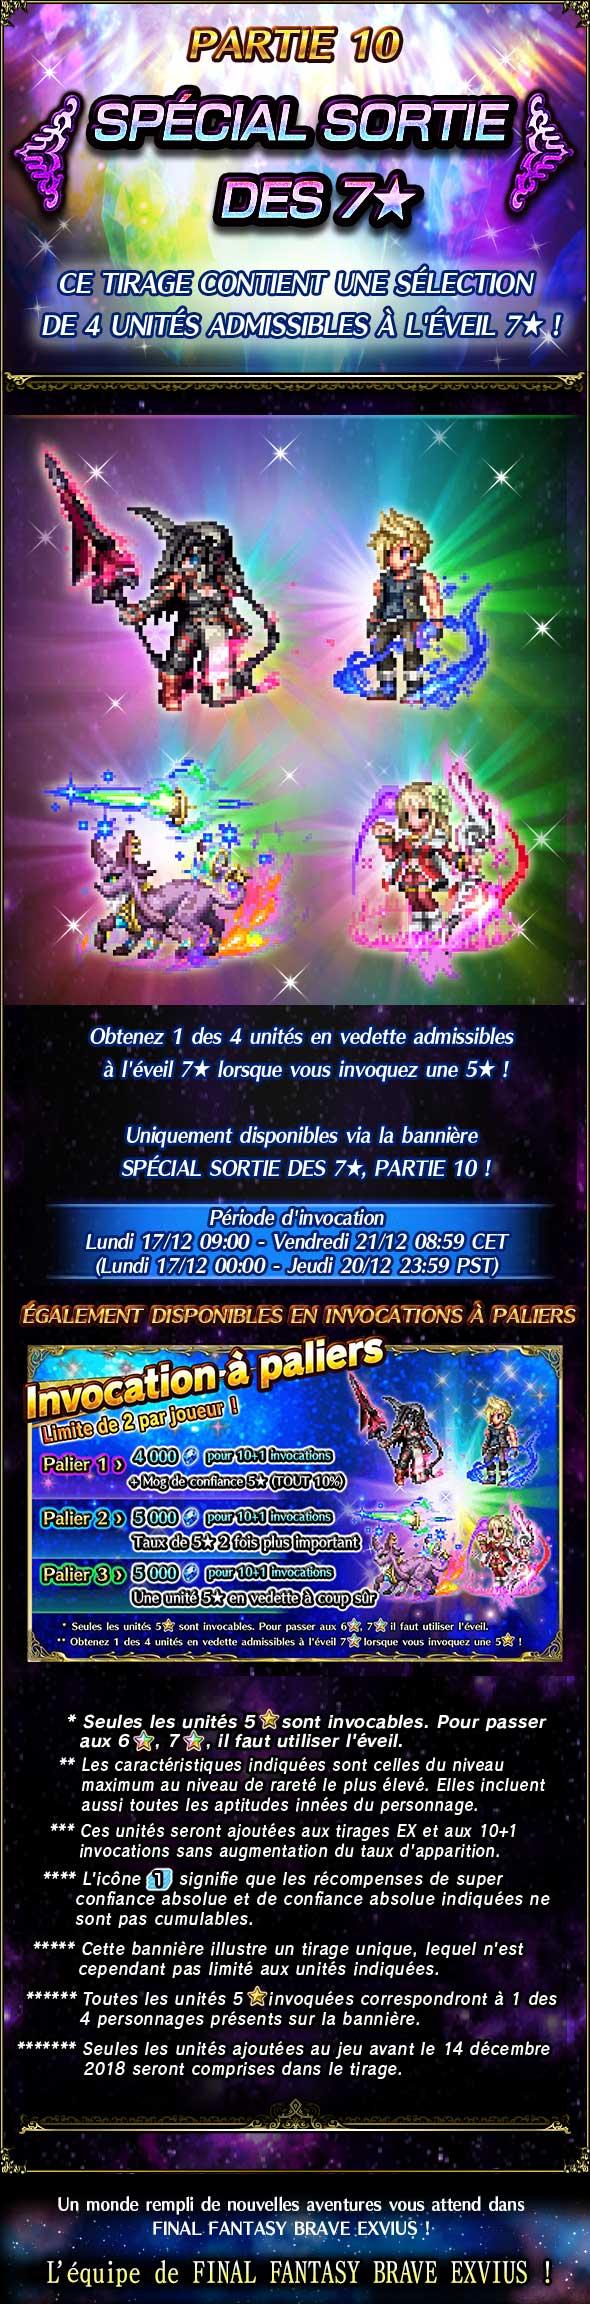 Invocations du moment - FFBE - Speciales sortie des 7* (lot 5) - du 14/12 au 21/12/18 7StarBatch10